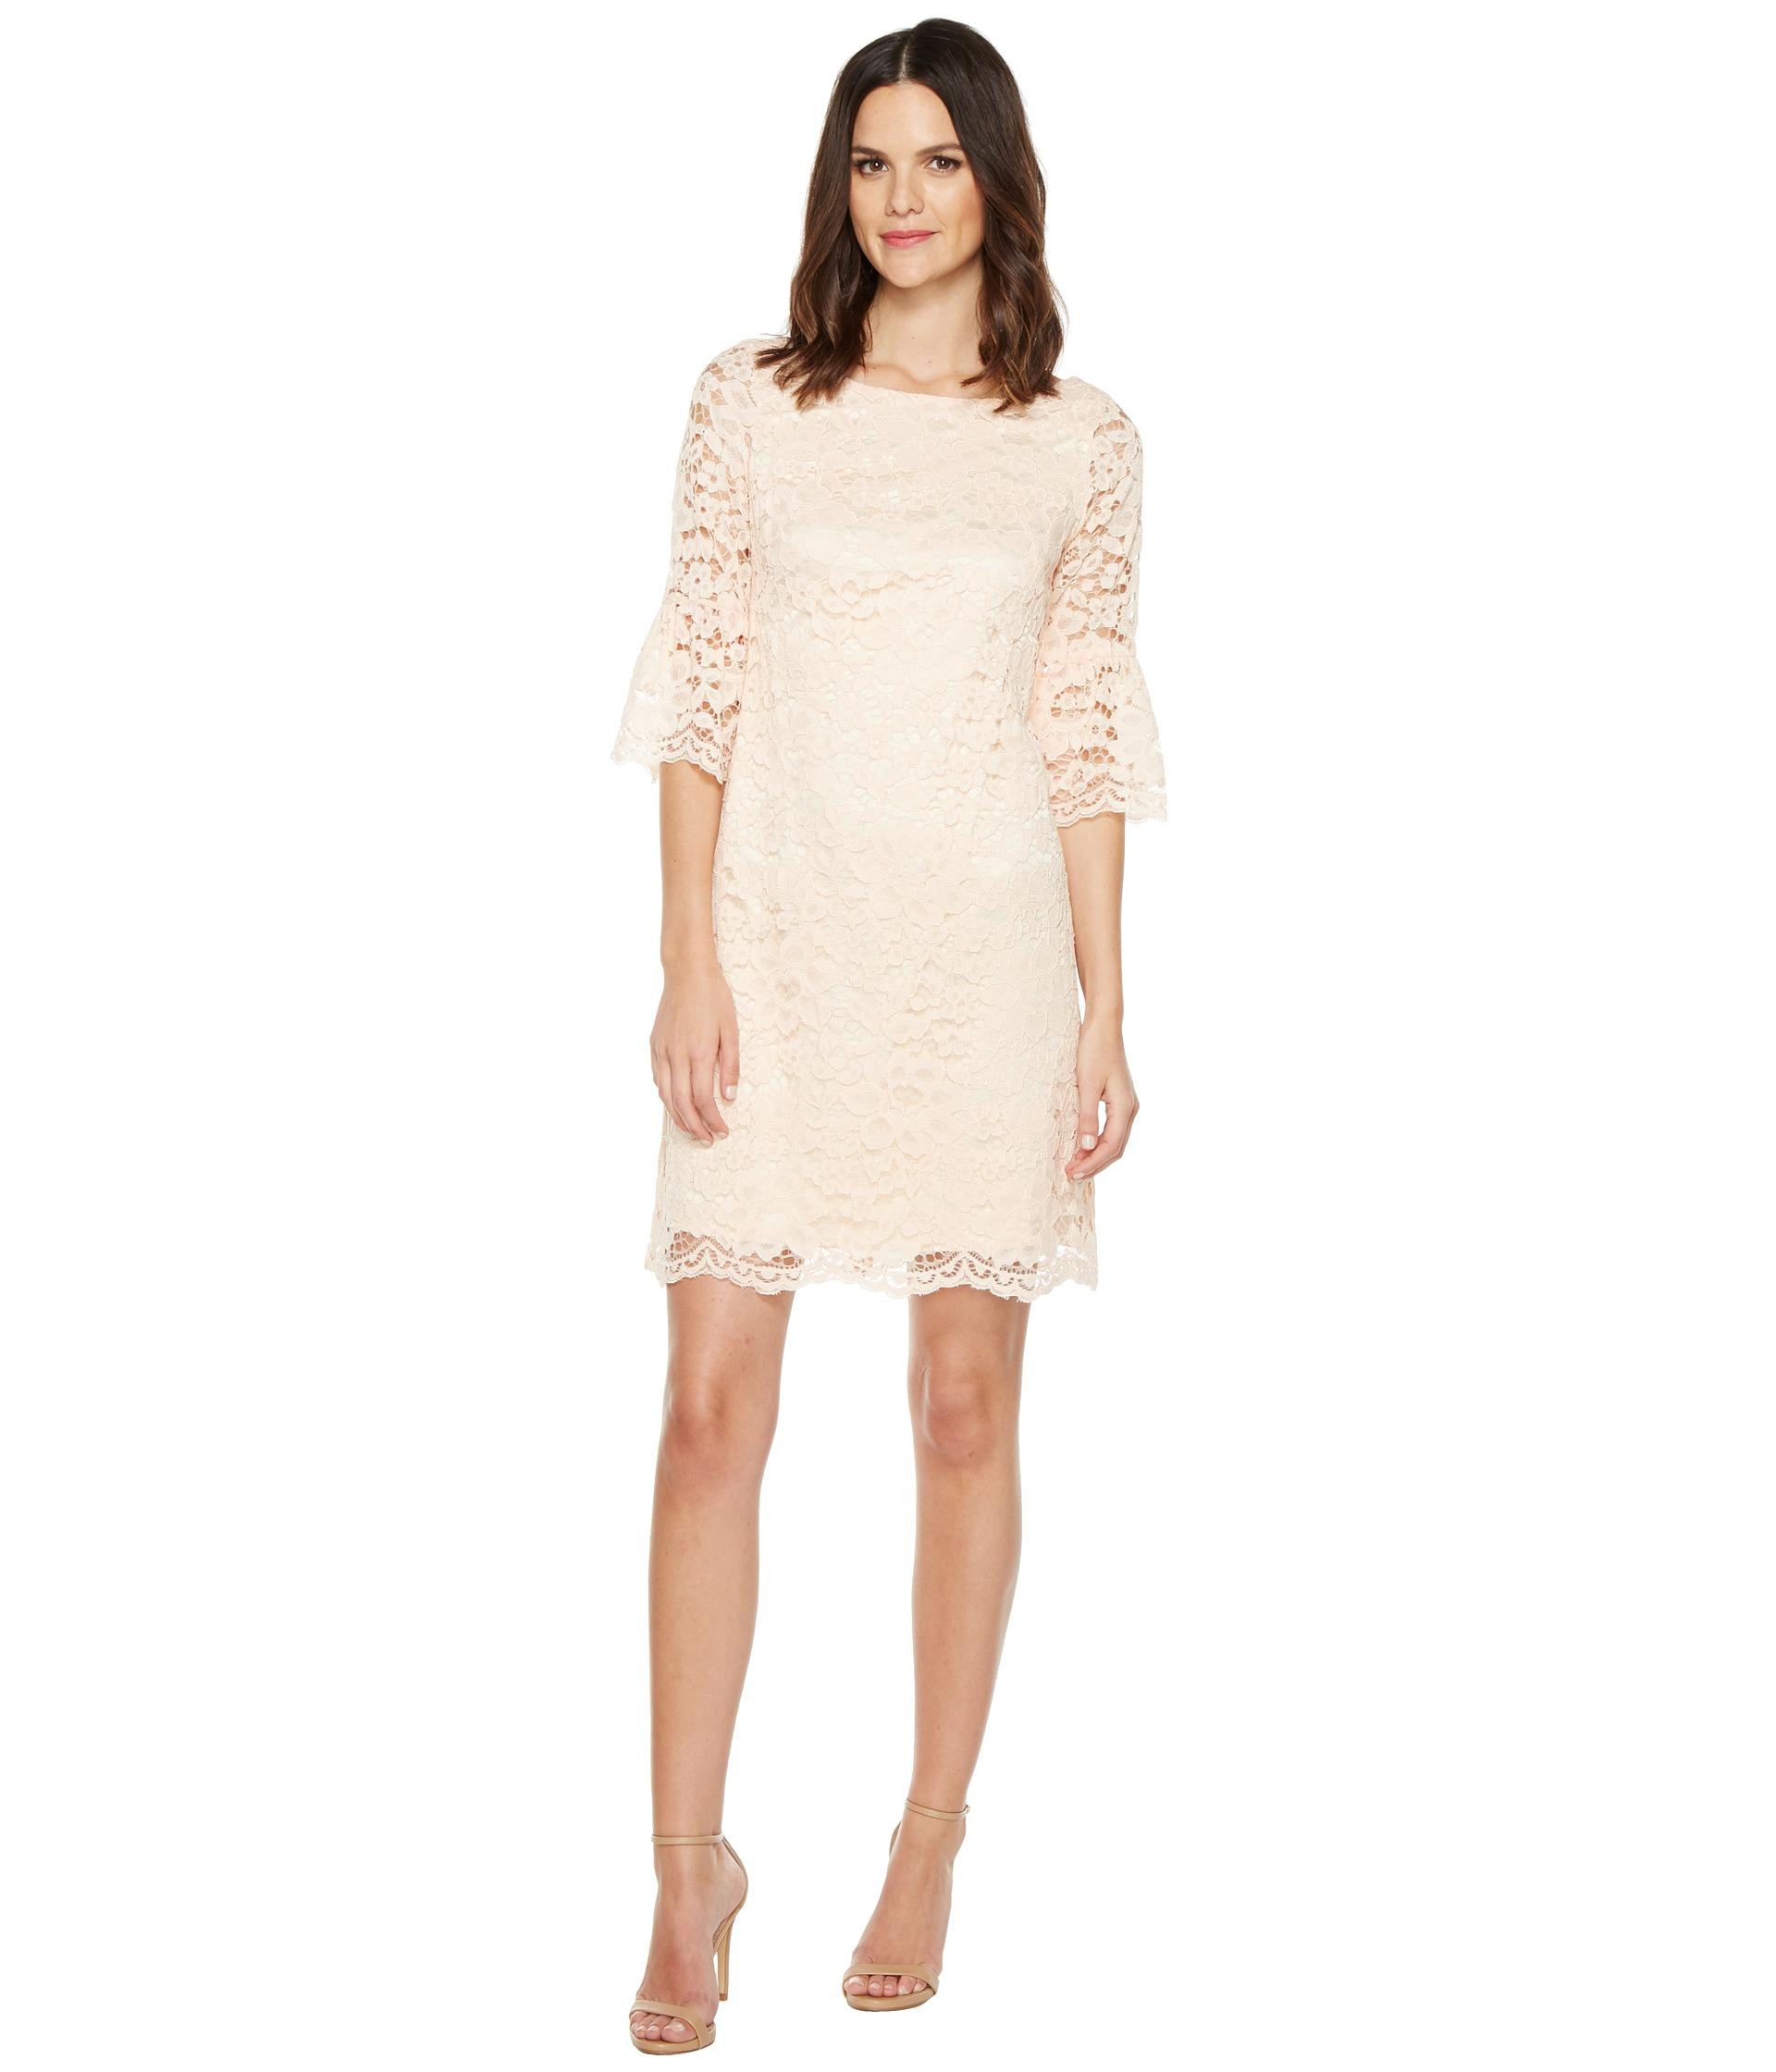 Adan Betsey Lace Dresses